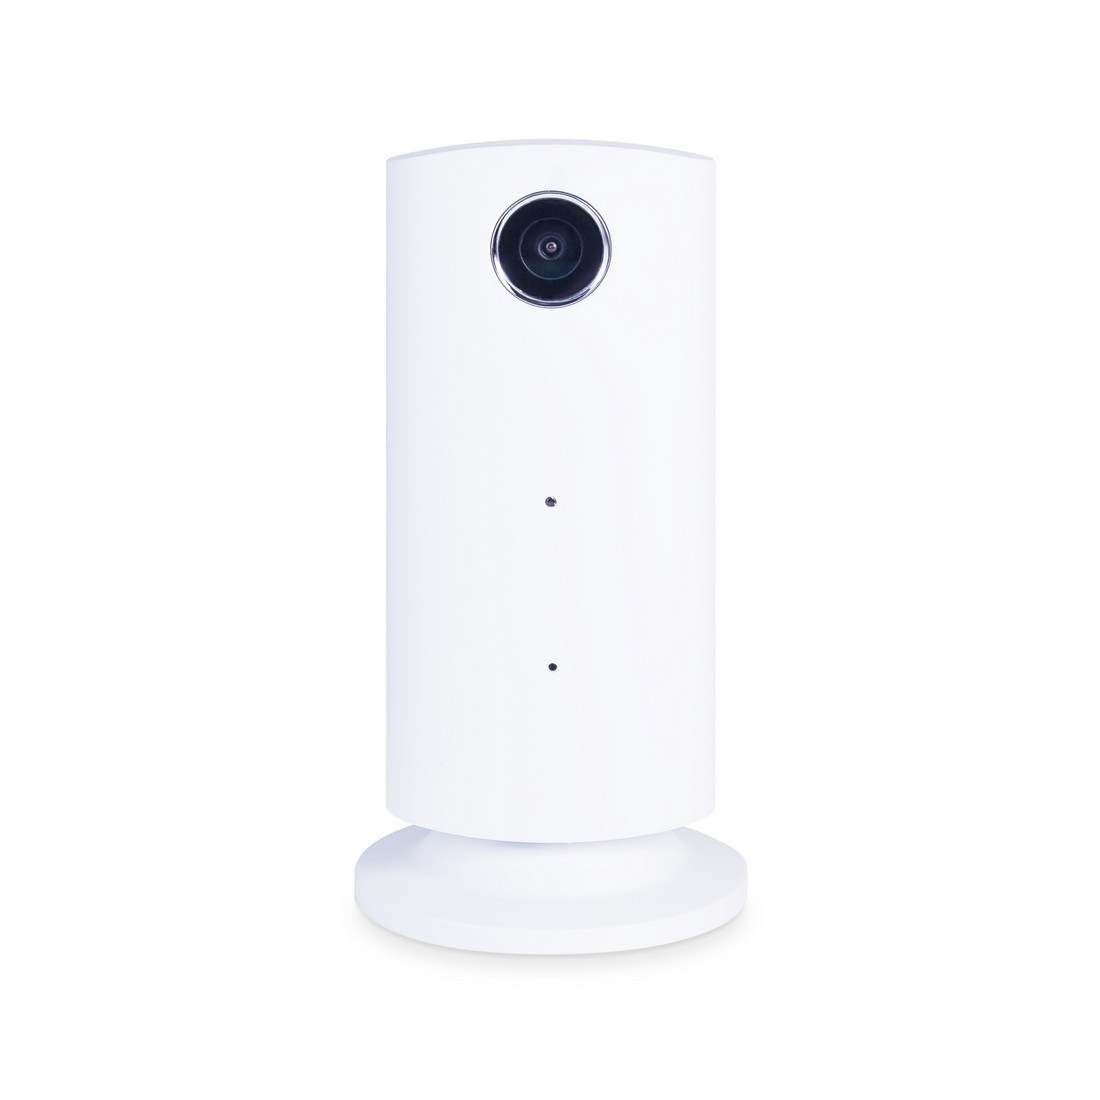 Видеоняня, JIMI, JH08, Wi-fi, HD 720p, SD карта до 32Gb, Датчик движения и звука, Поликарбонат, Белый